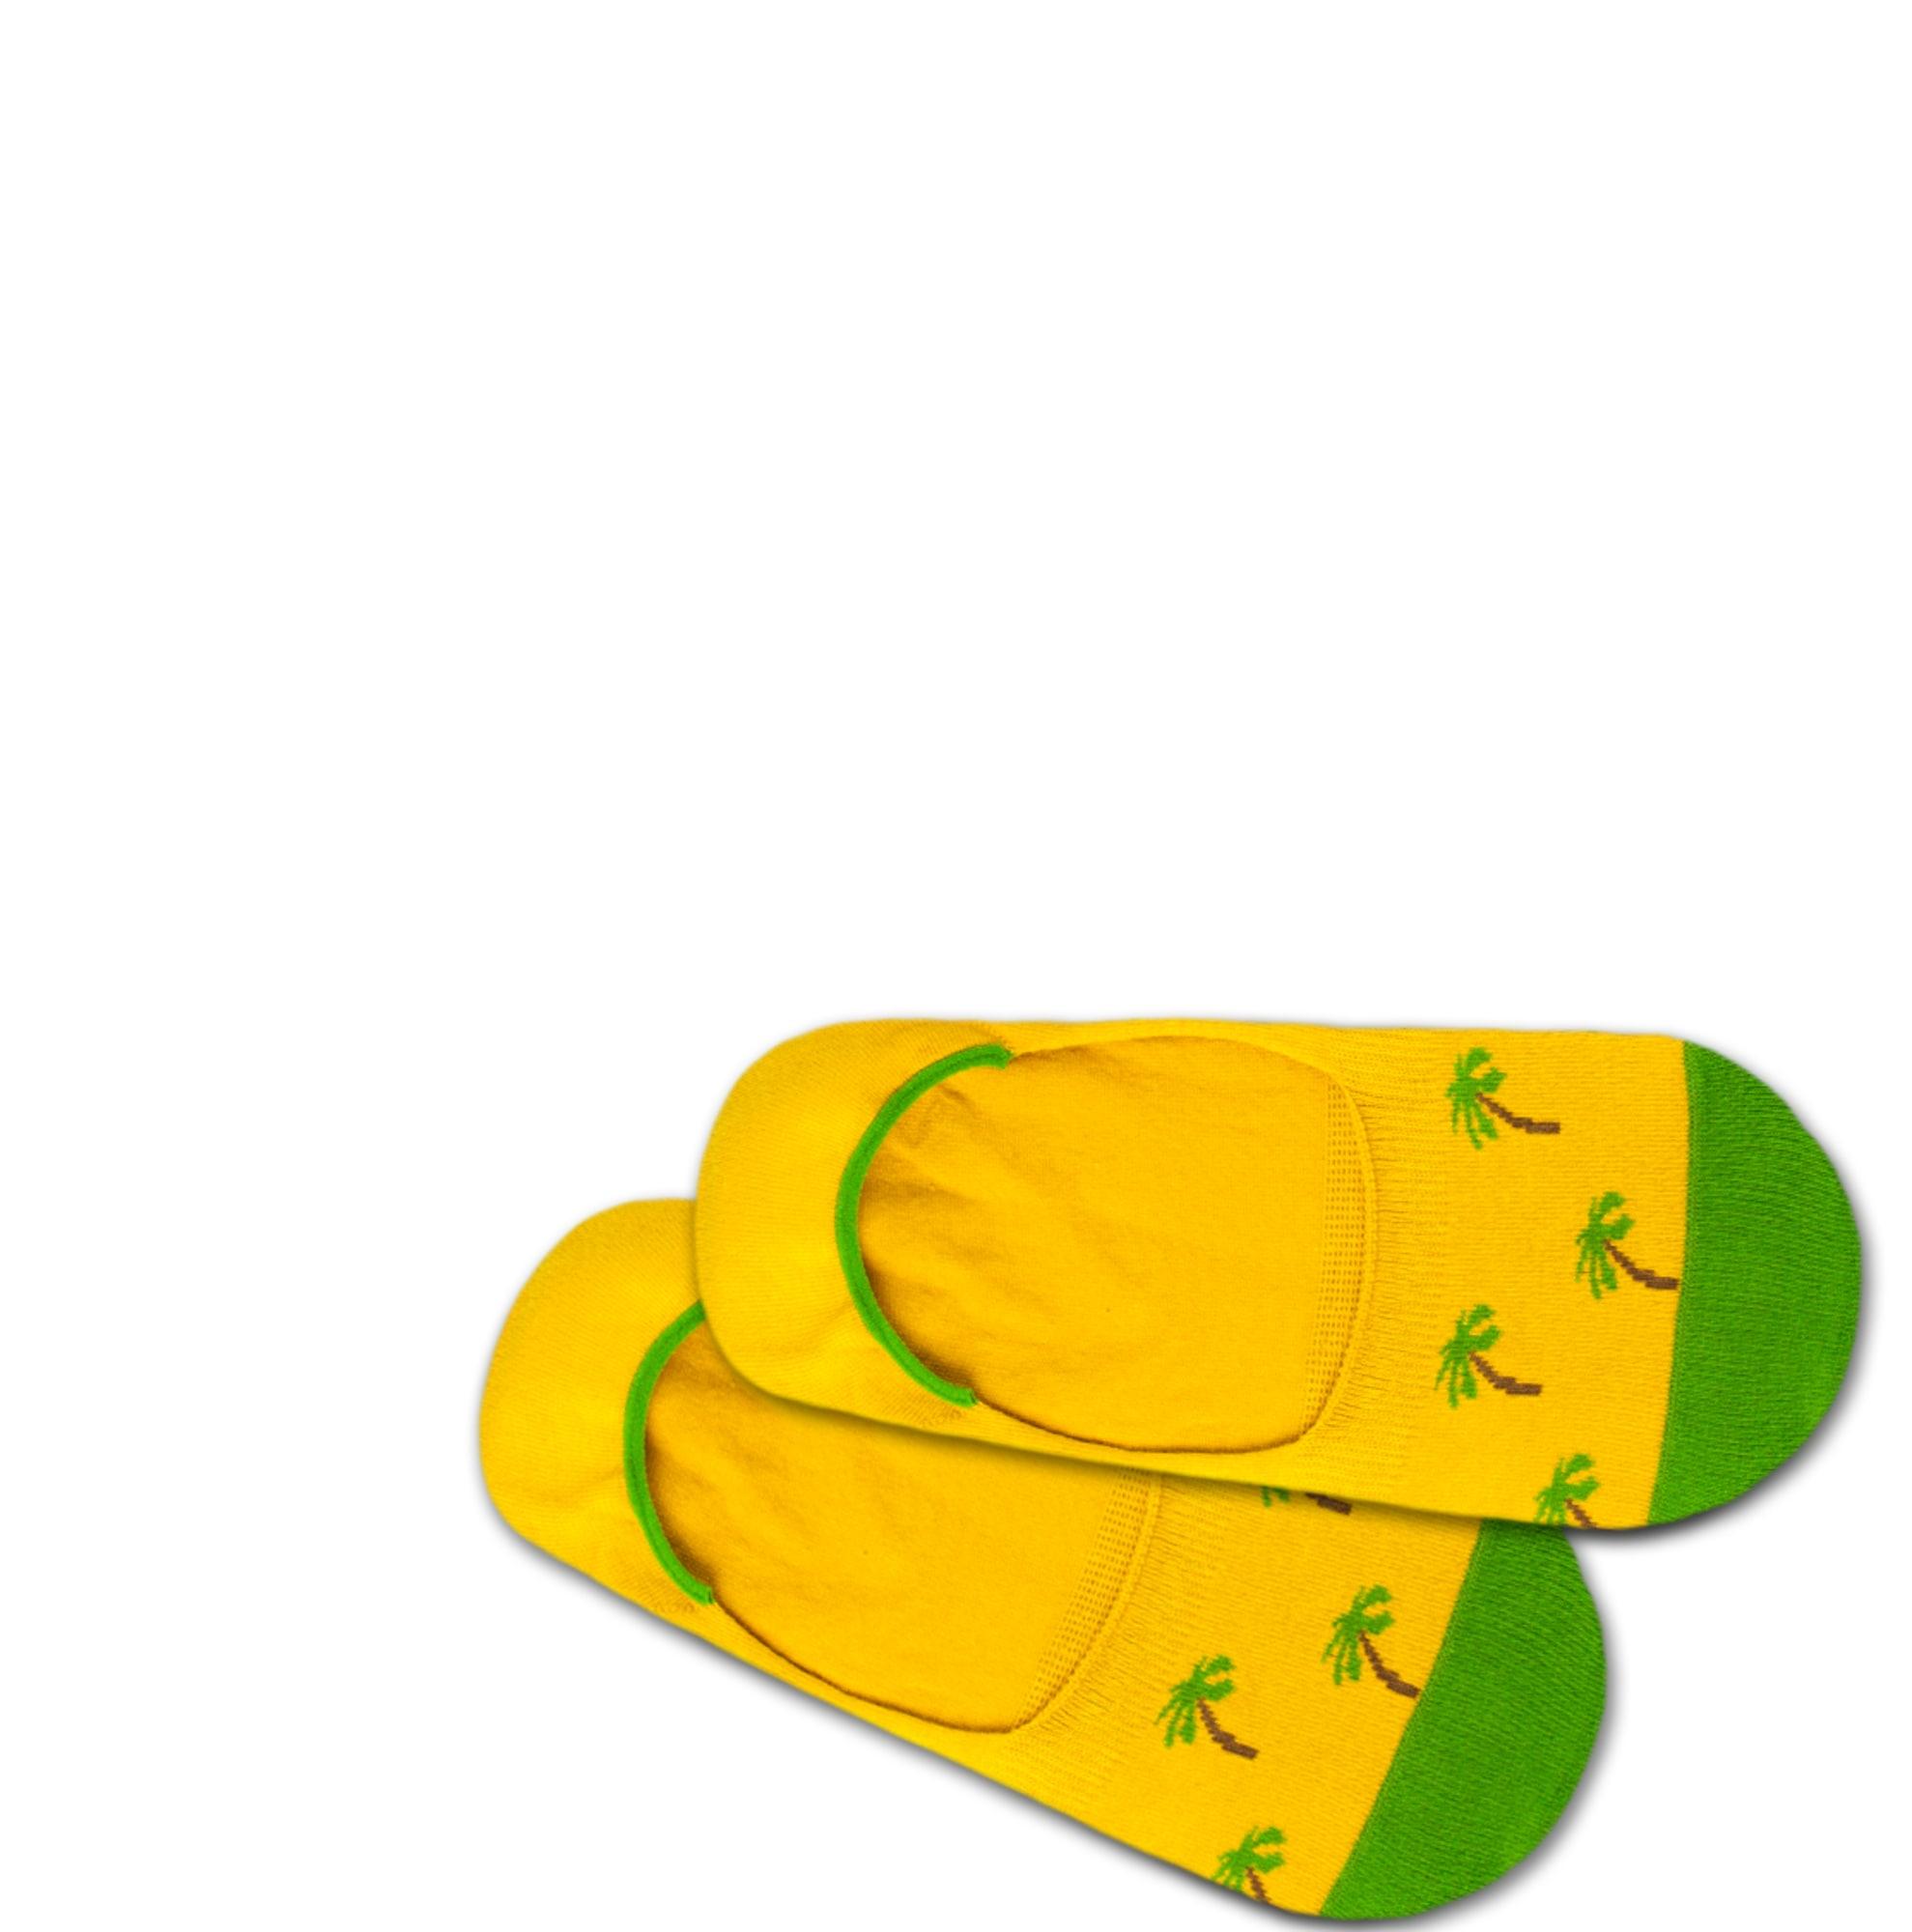 Ťapky Hidden Palm Beach žlutá zelená DillySocks